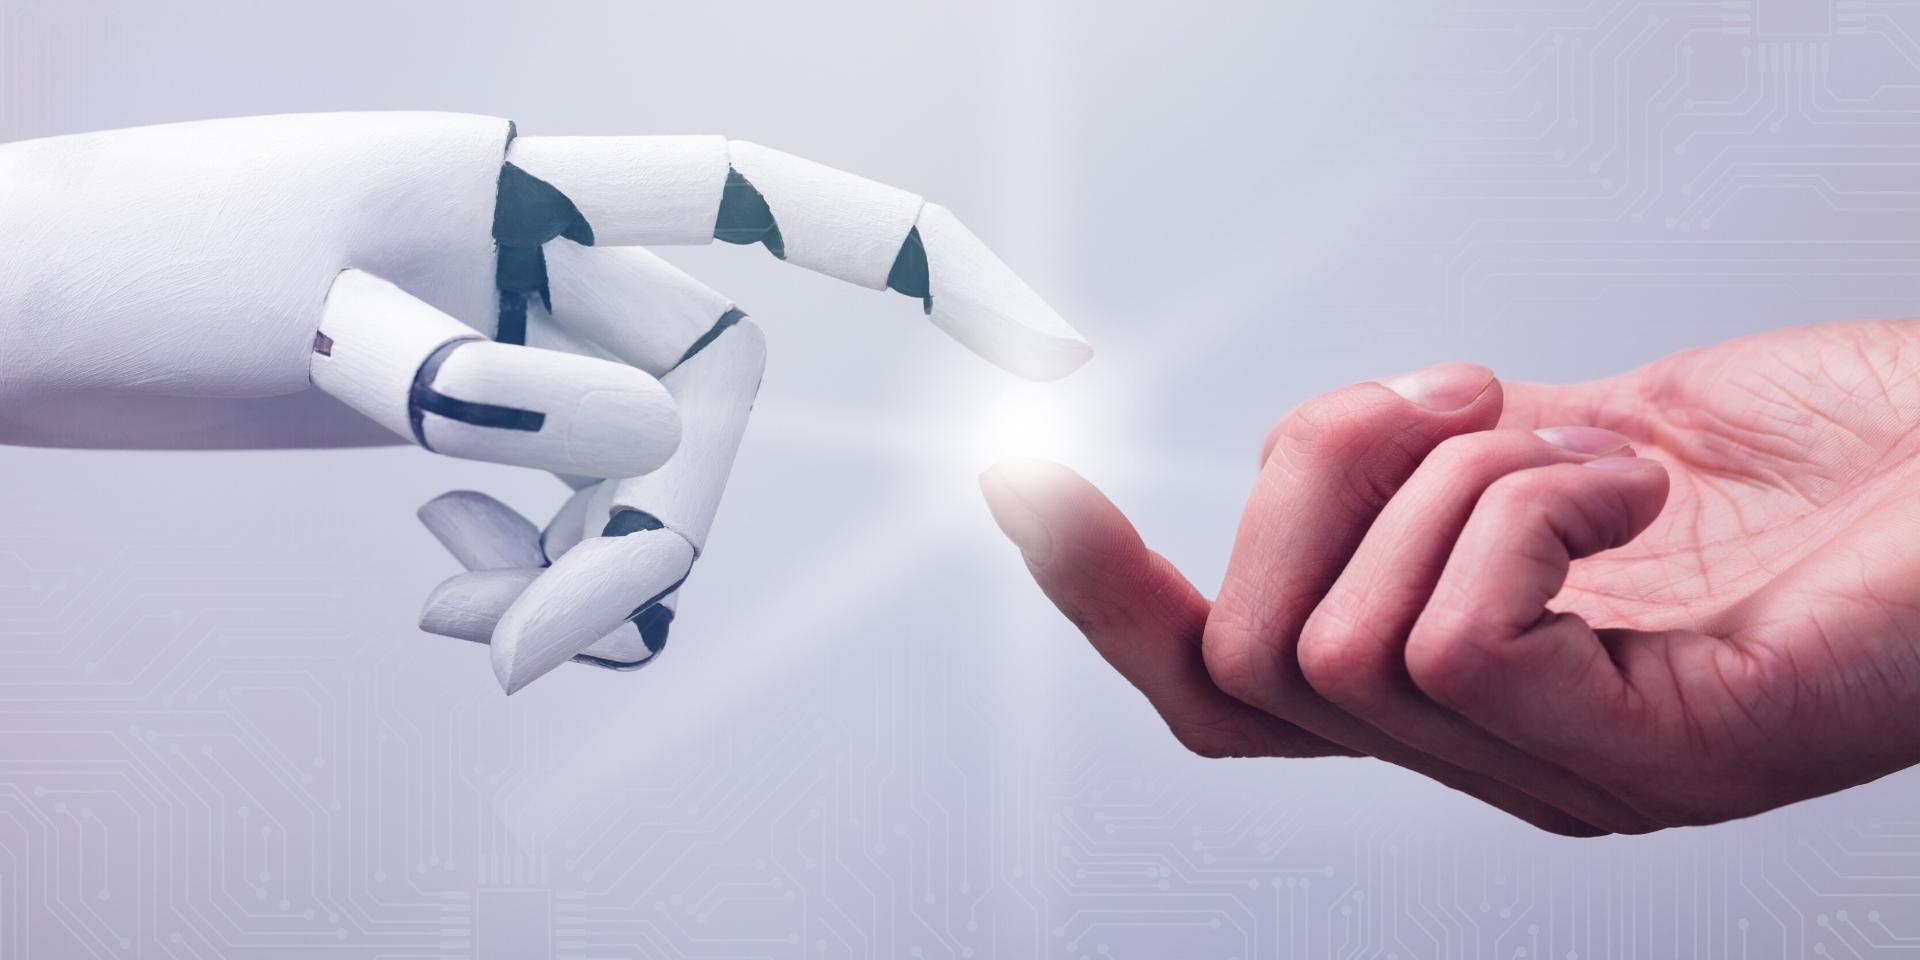 robótica avanzada